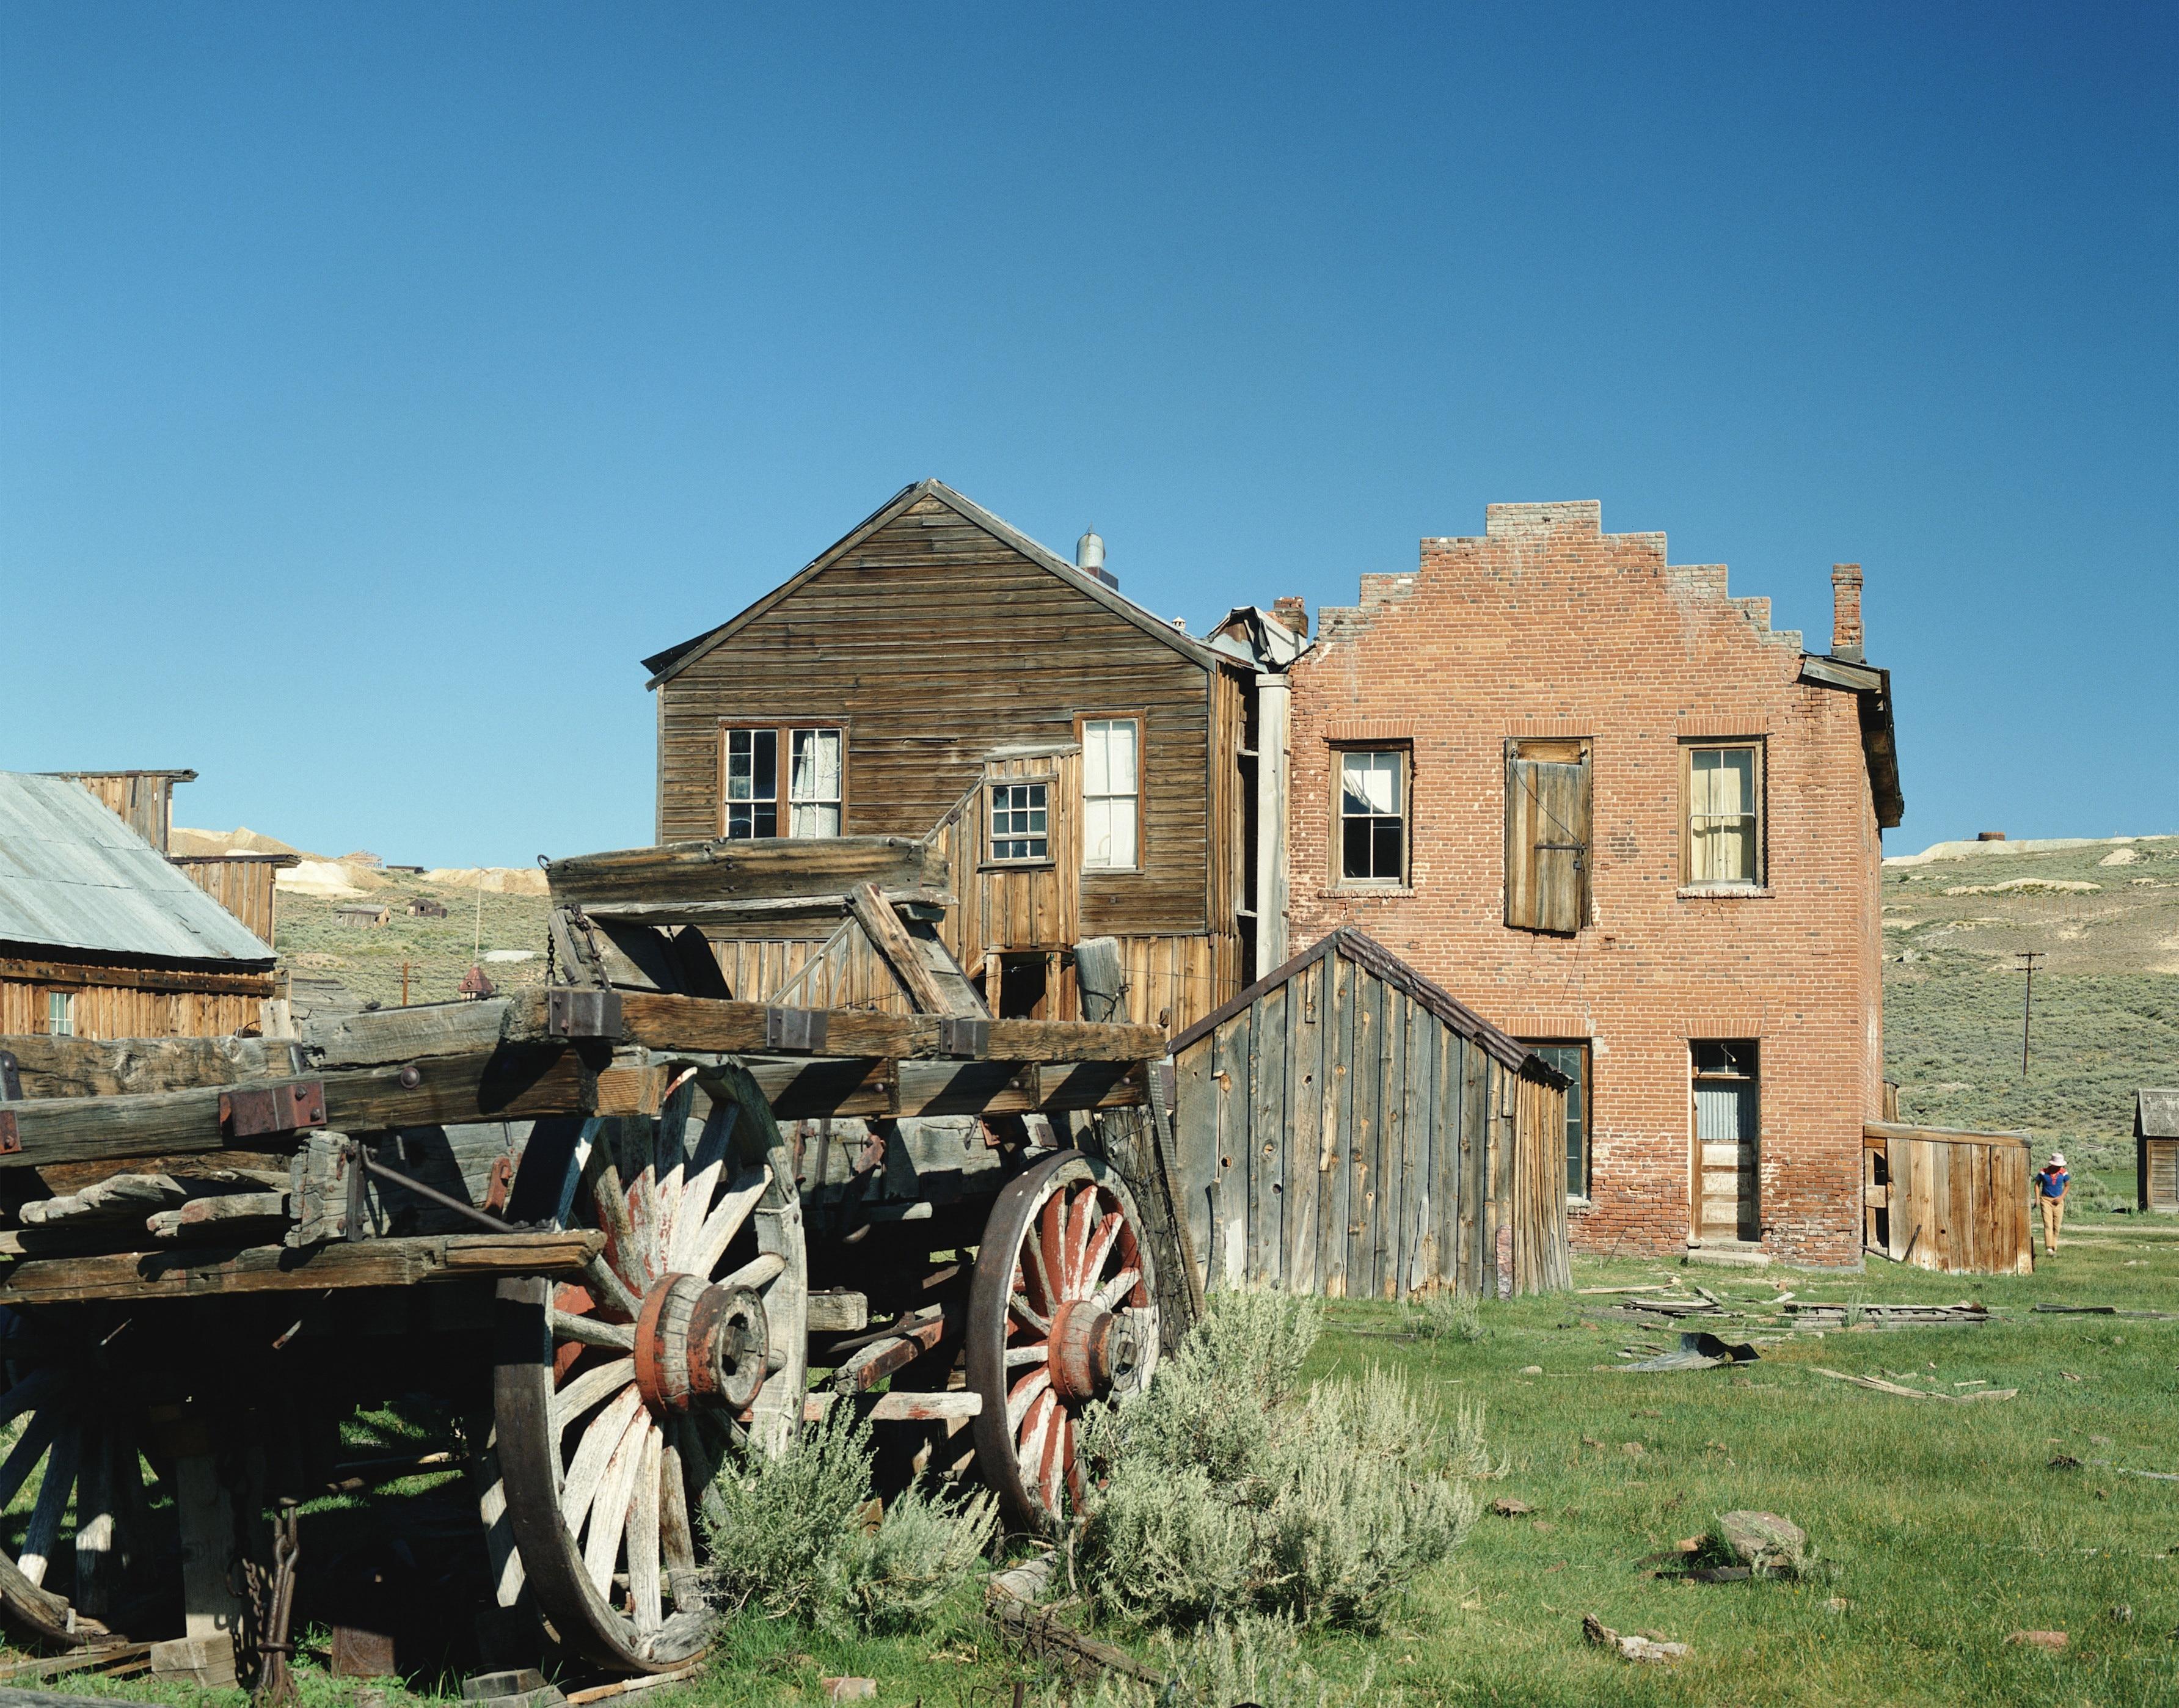 Calaveras County, California, United States of America